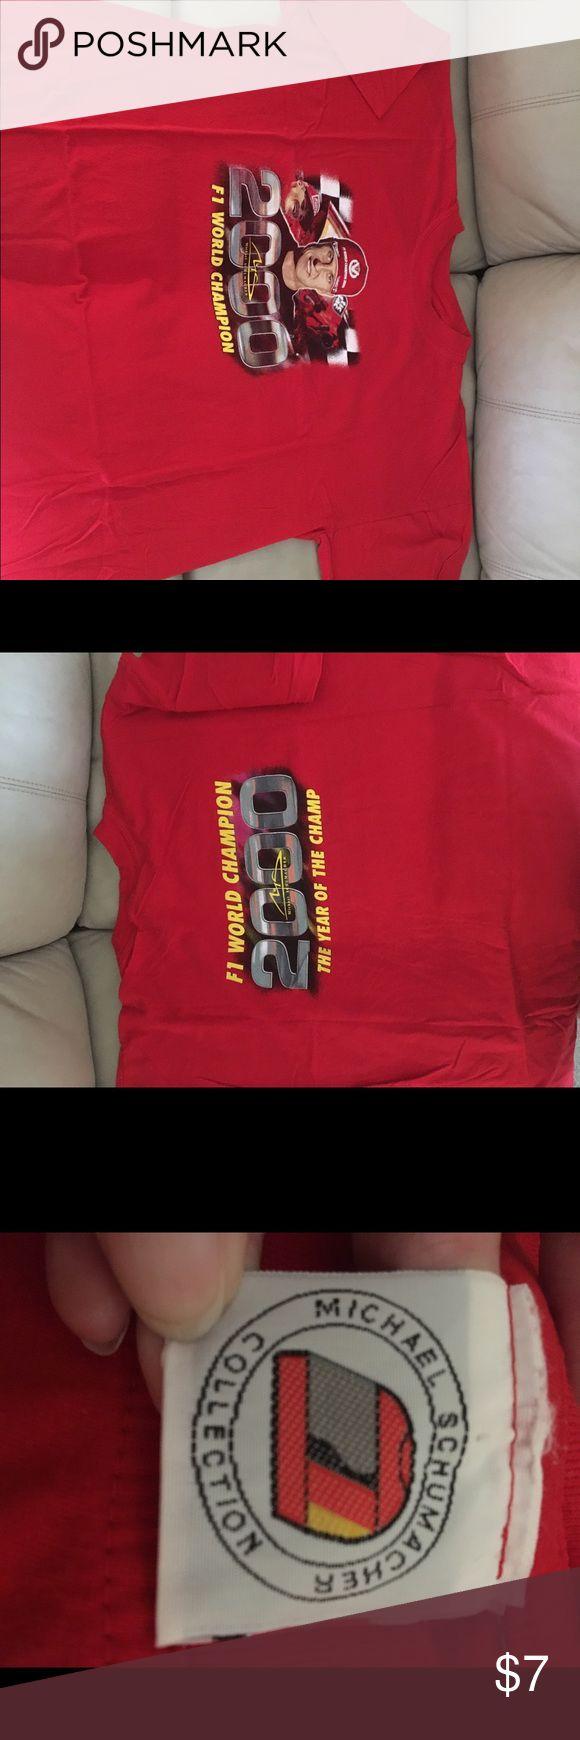 Michael Schumacker F1 Racing XXL TShirt Michael Schumacker F1 Racing XXL TShirt Vintage Shirts Tees - Short Sleeve